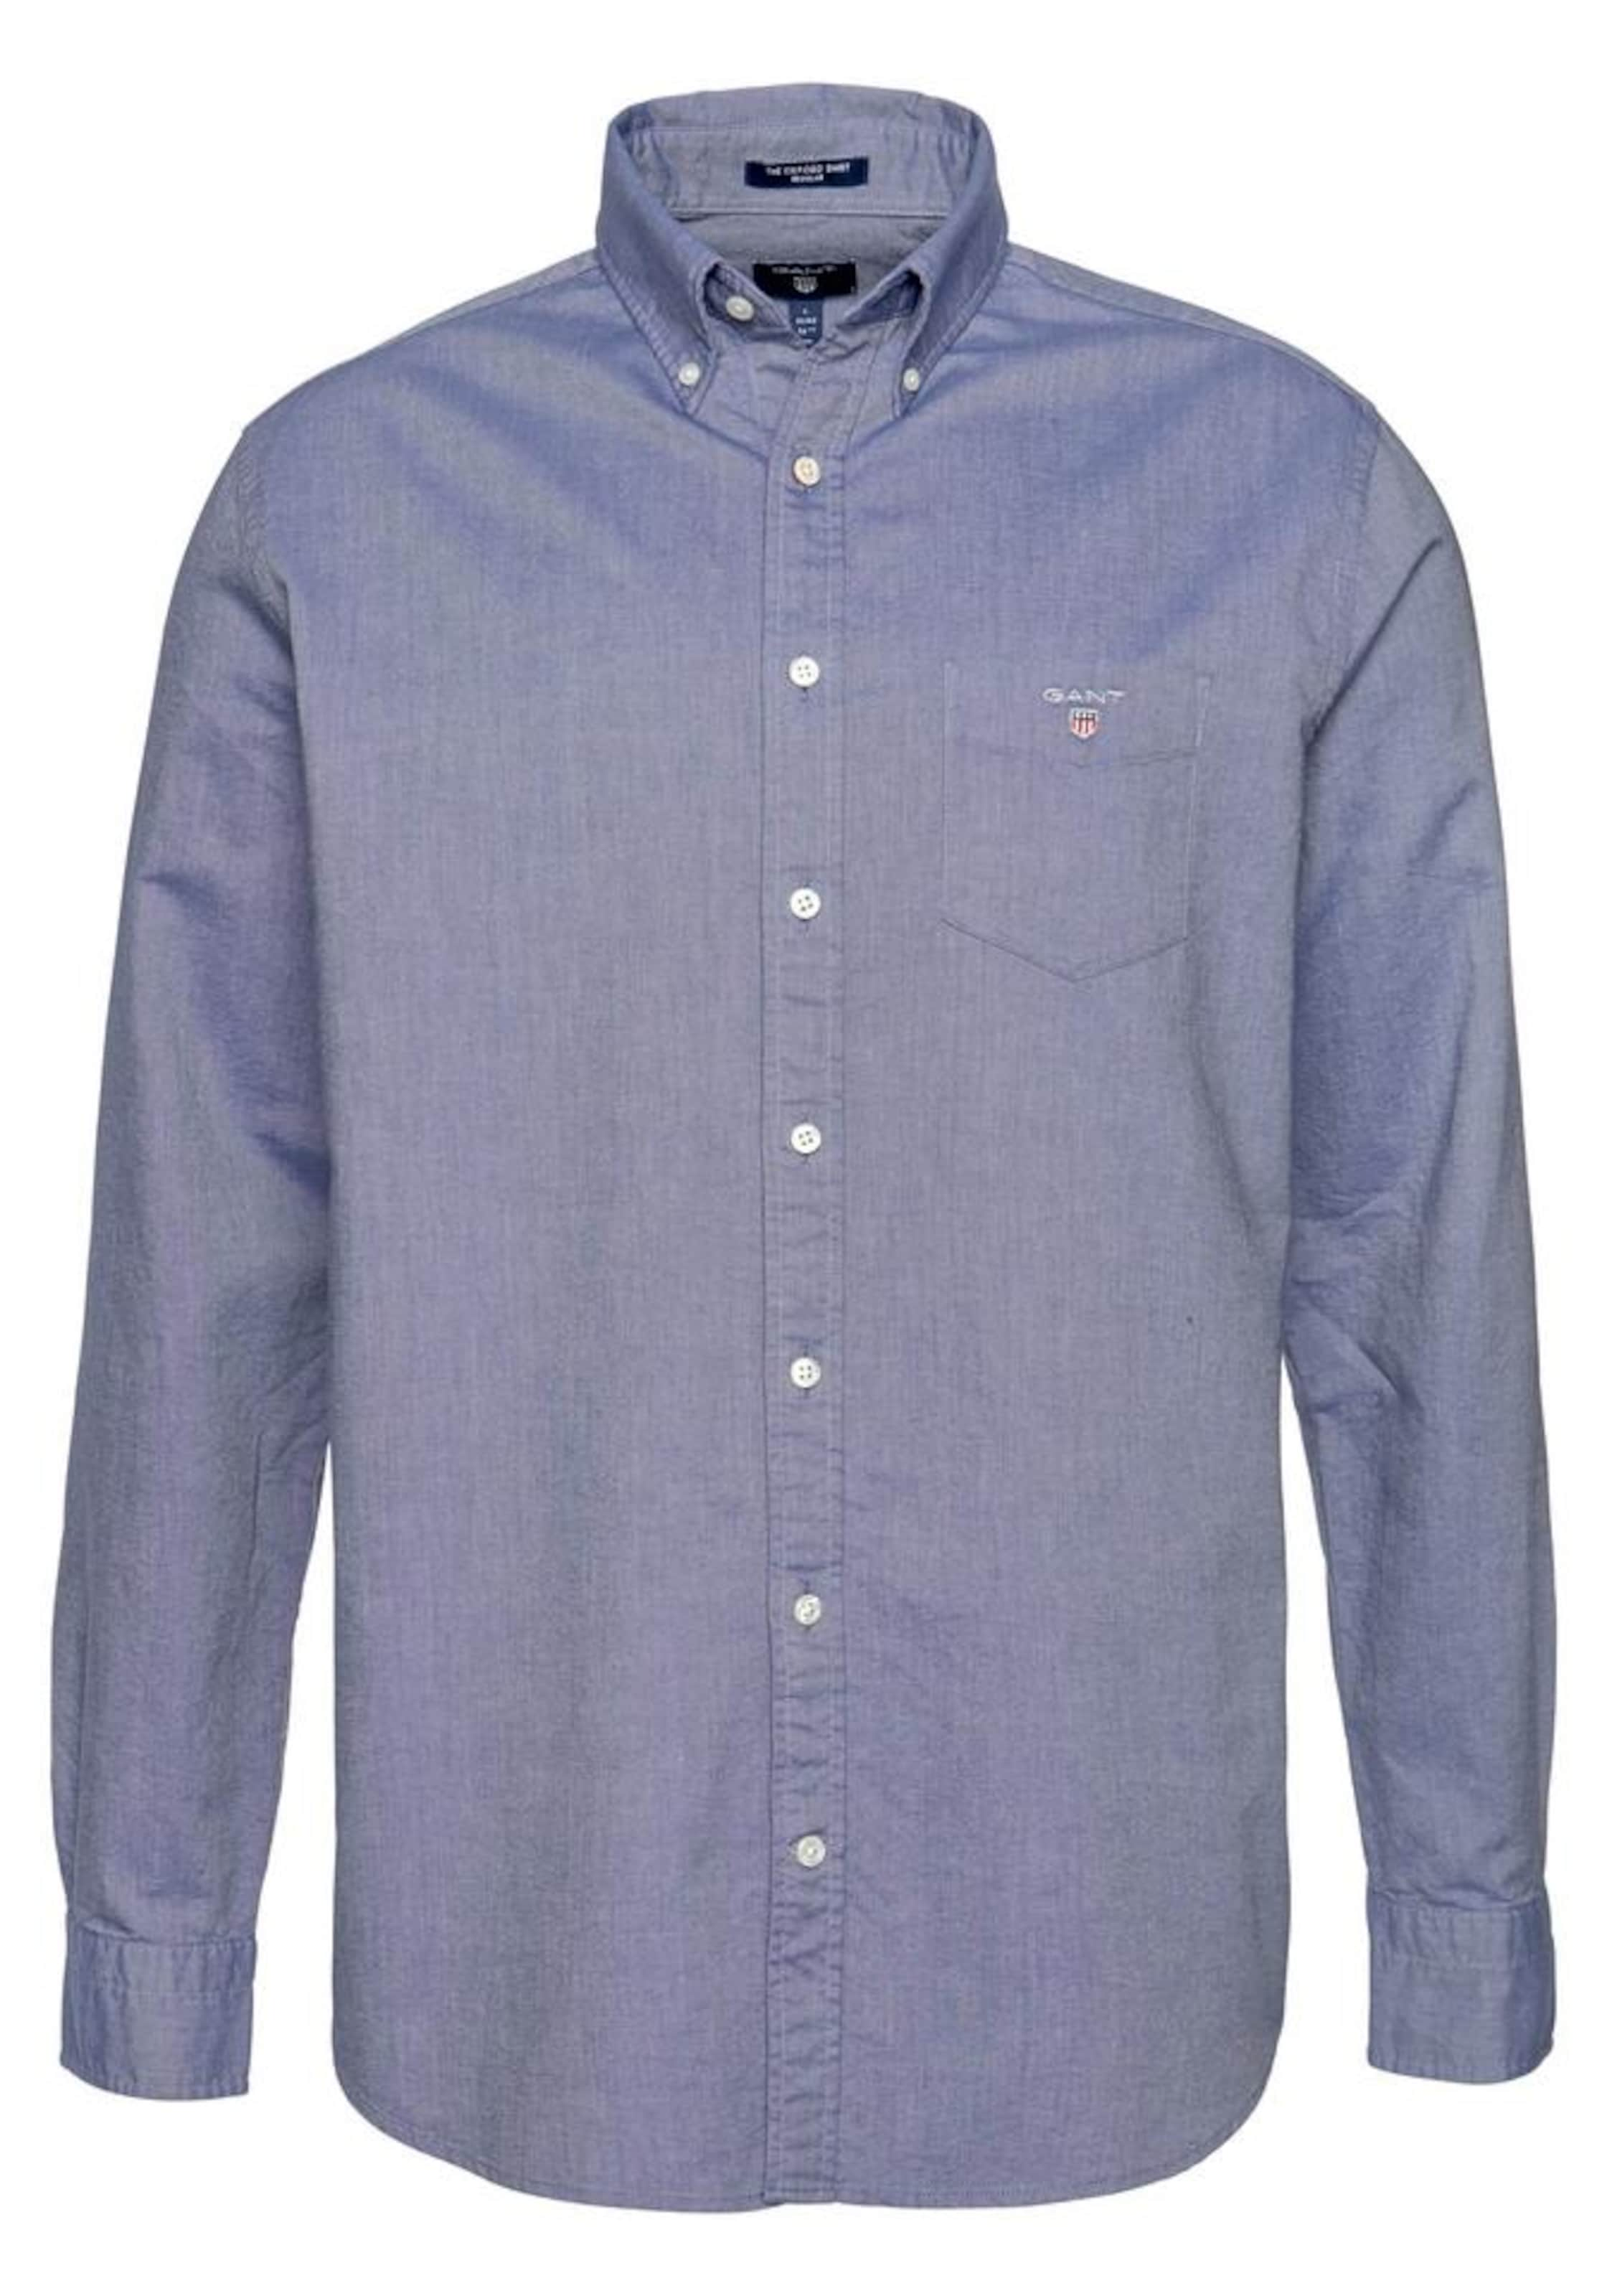 Gant In Shirt 'the Taubenblau Hemd Bd' Oxford fyY6gImb7v